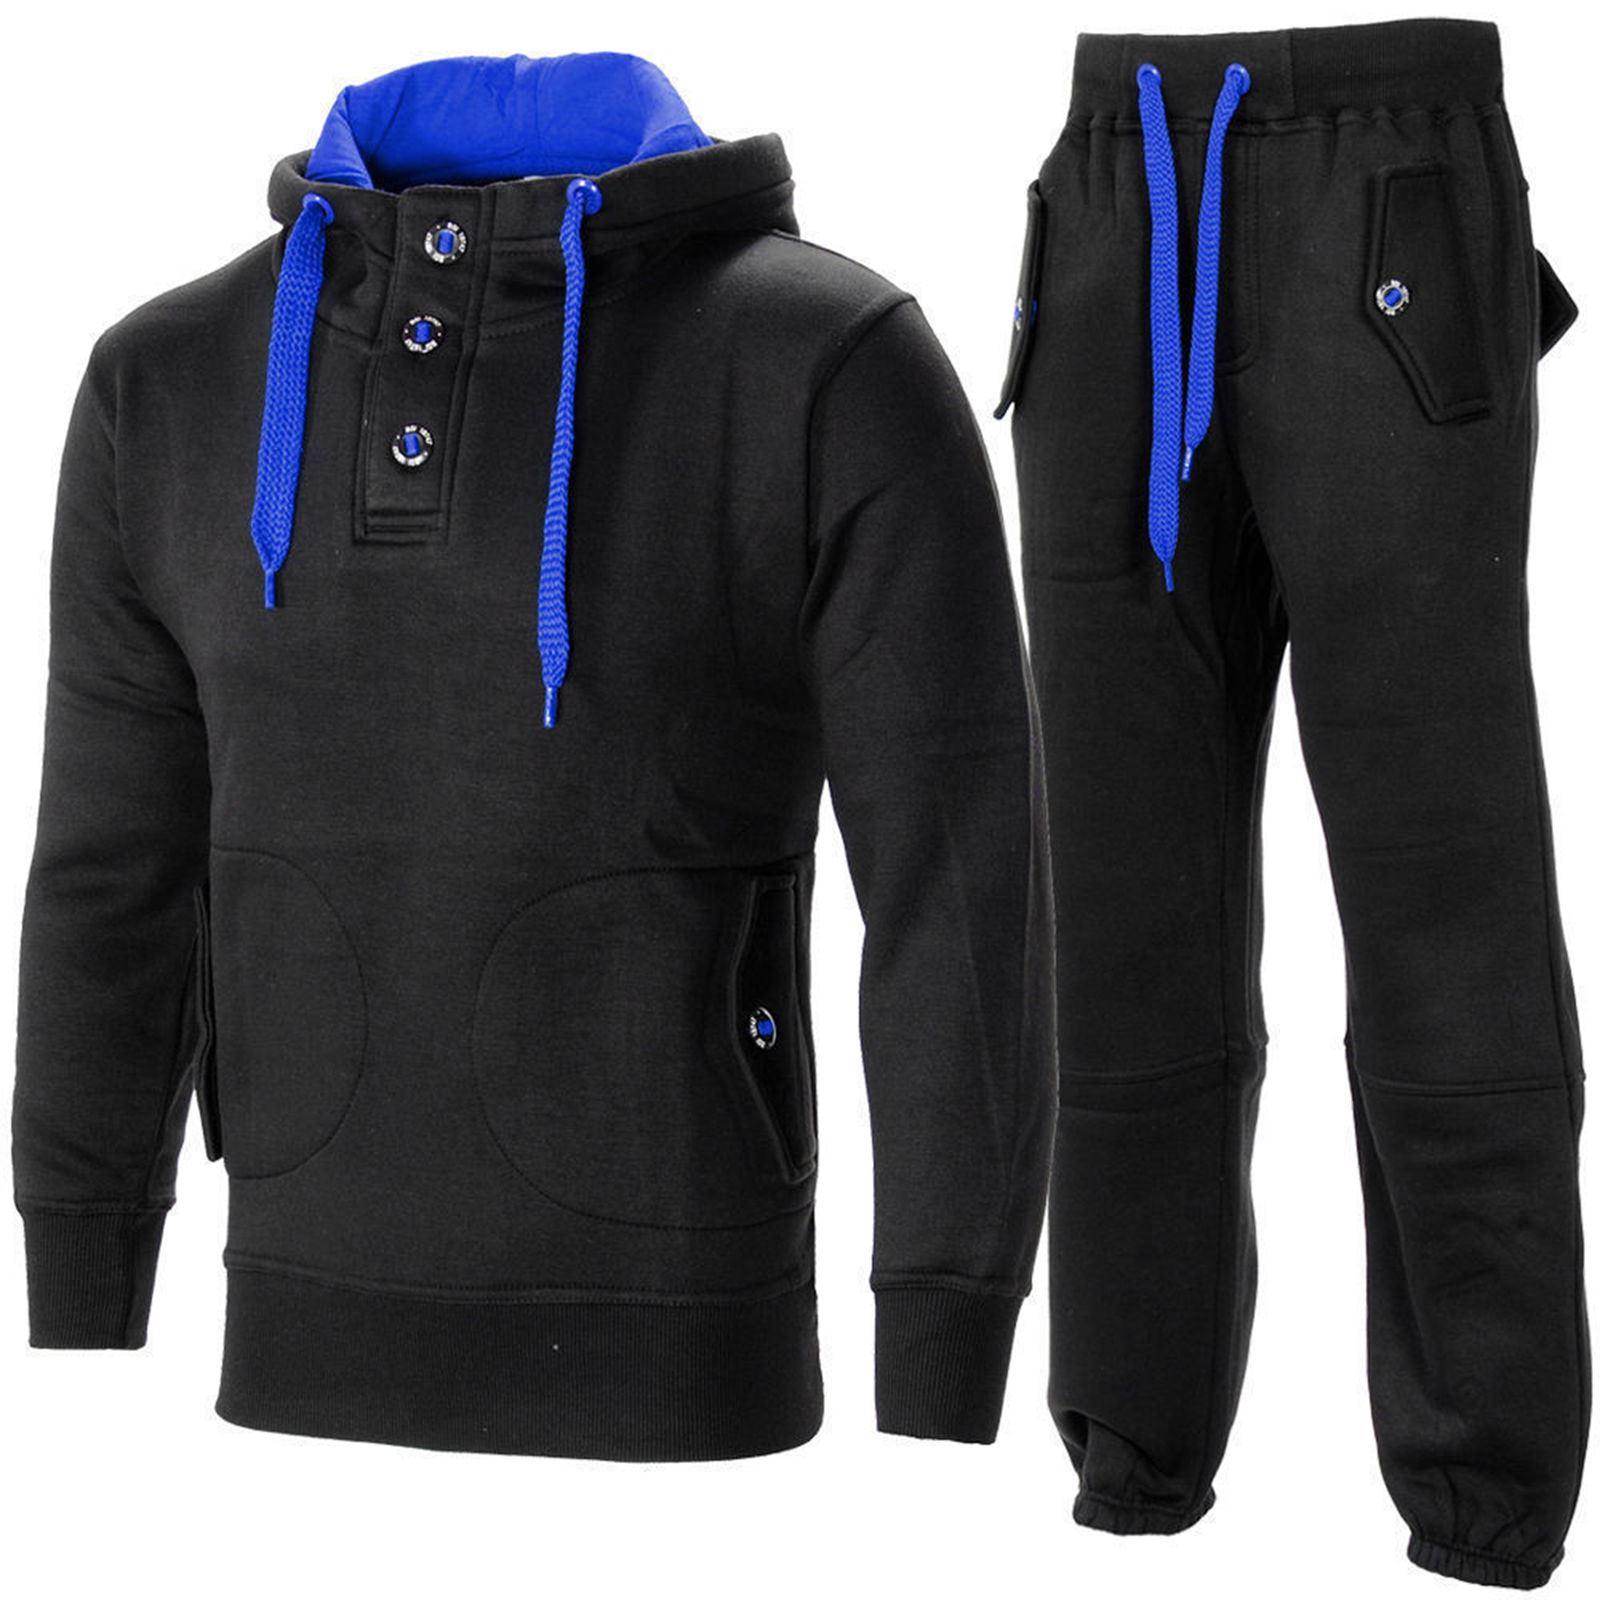 Mens hooded tracksuit gym contrast jogging full top fleece for Gimnasio 9 entre 40 y 41